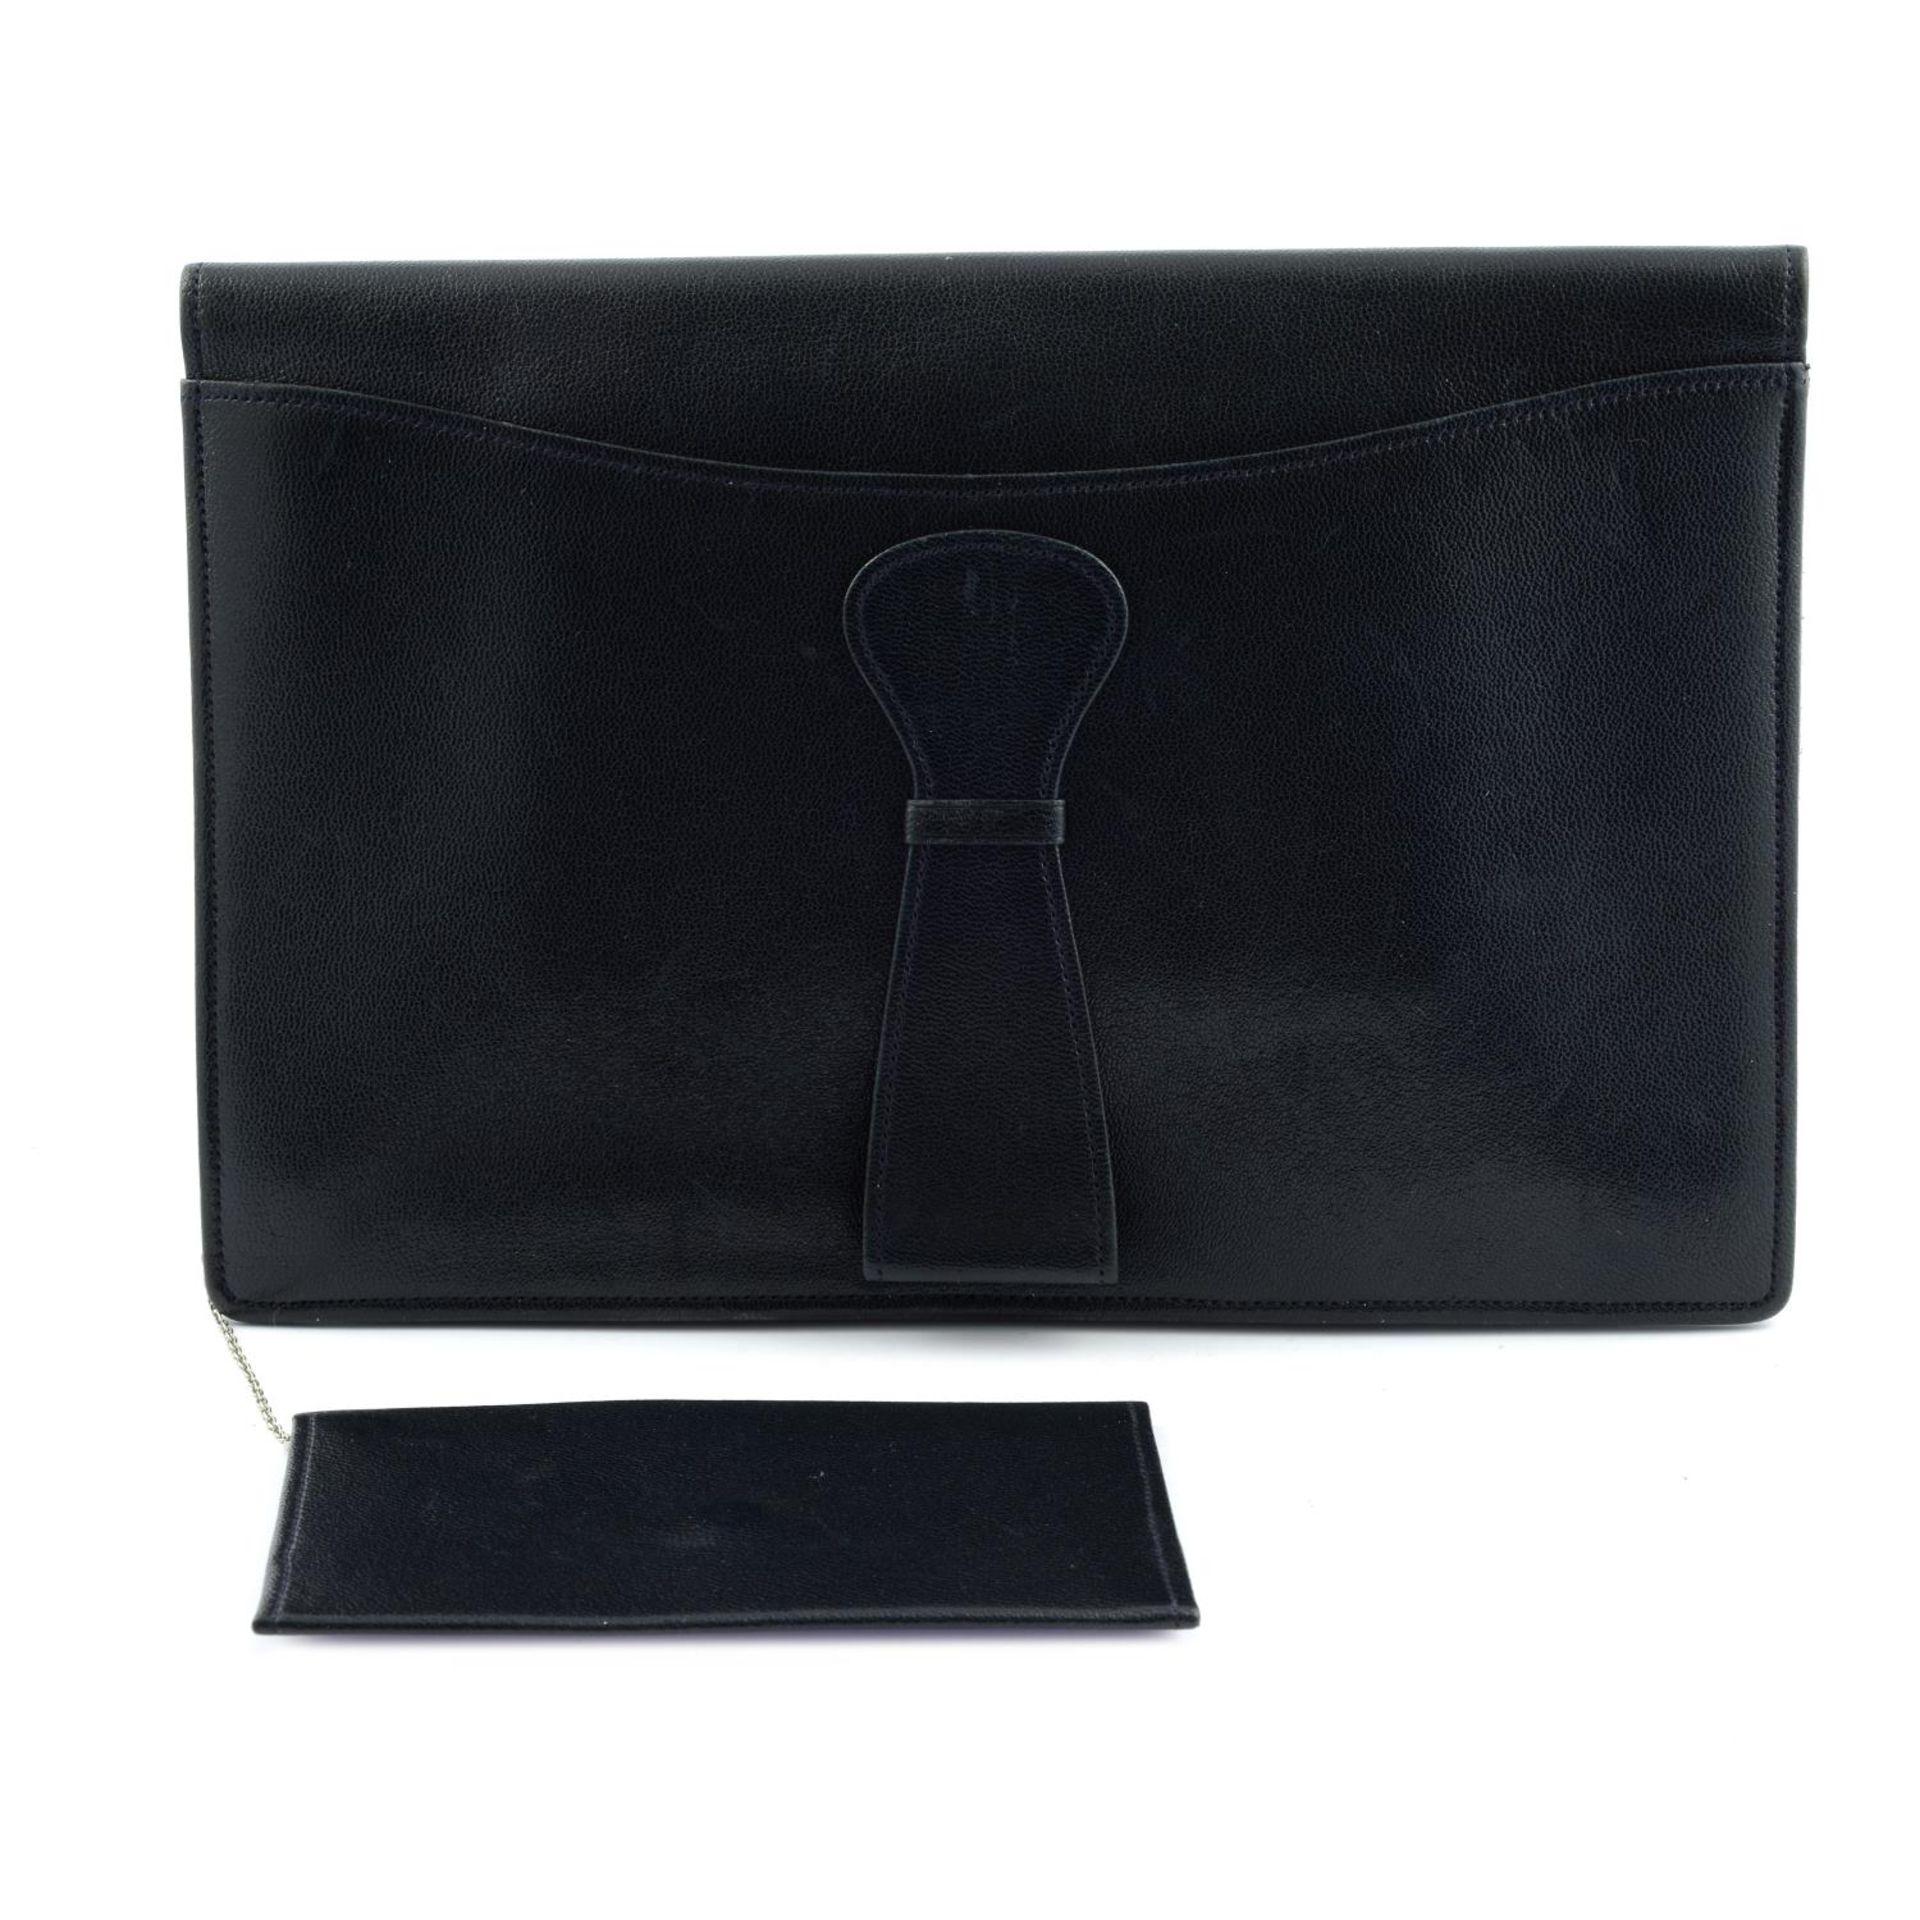 ASPREY - a vintage leather clutch. - Image 2 of 3